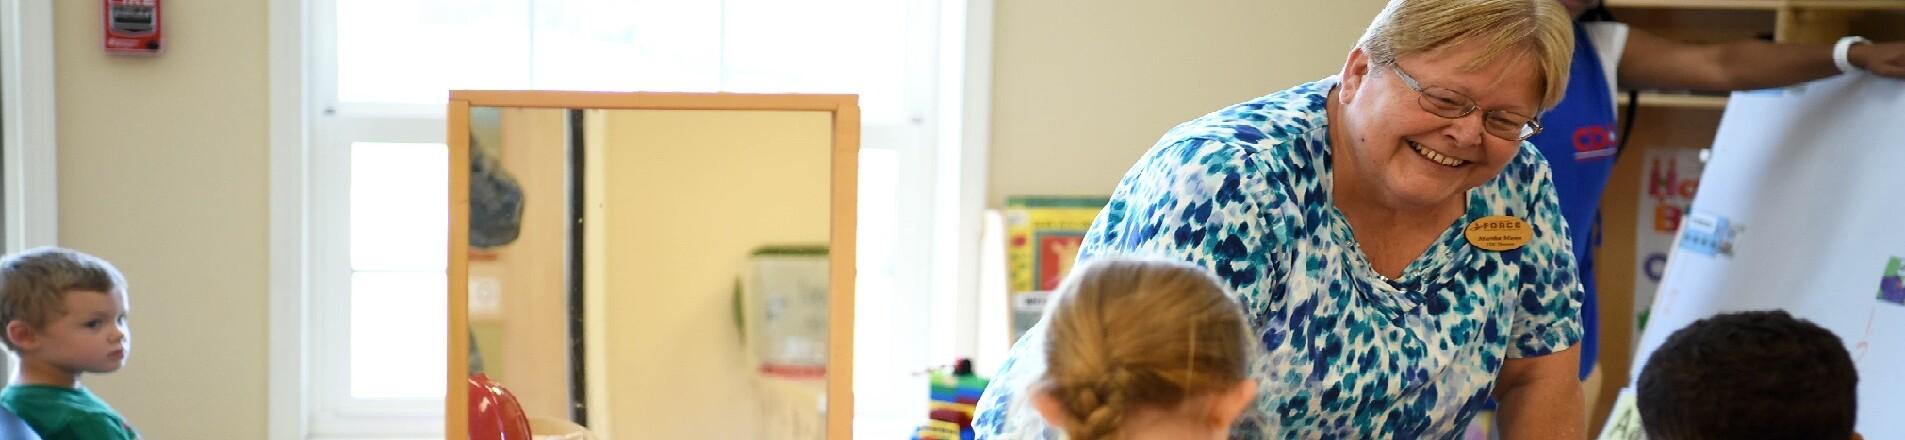 Shared childcare improves women's career progression